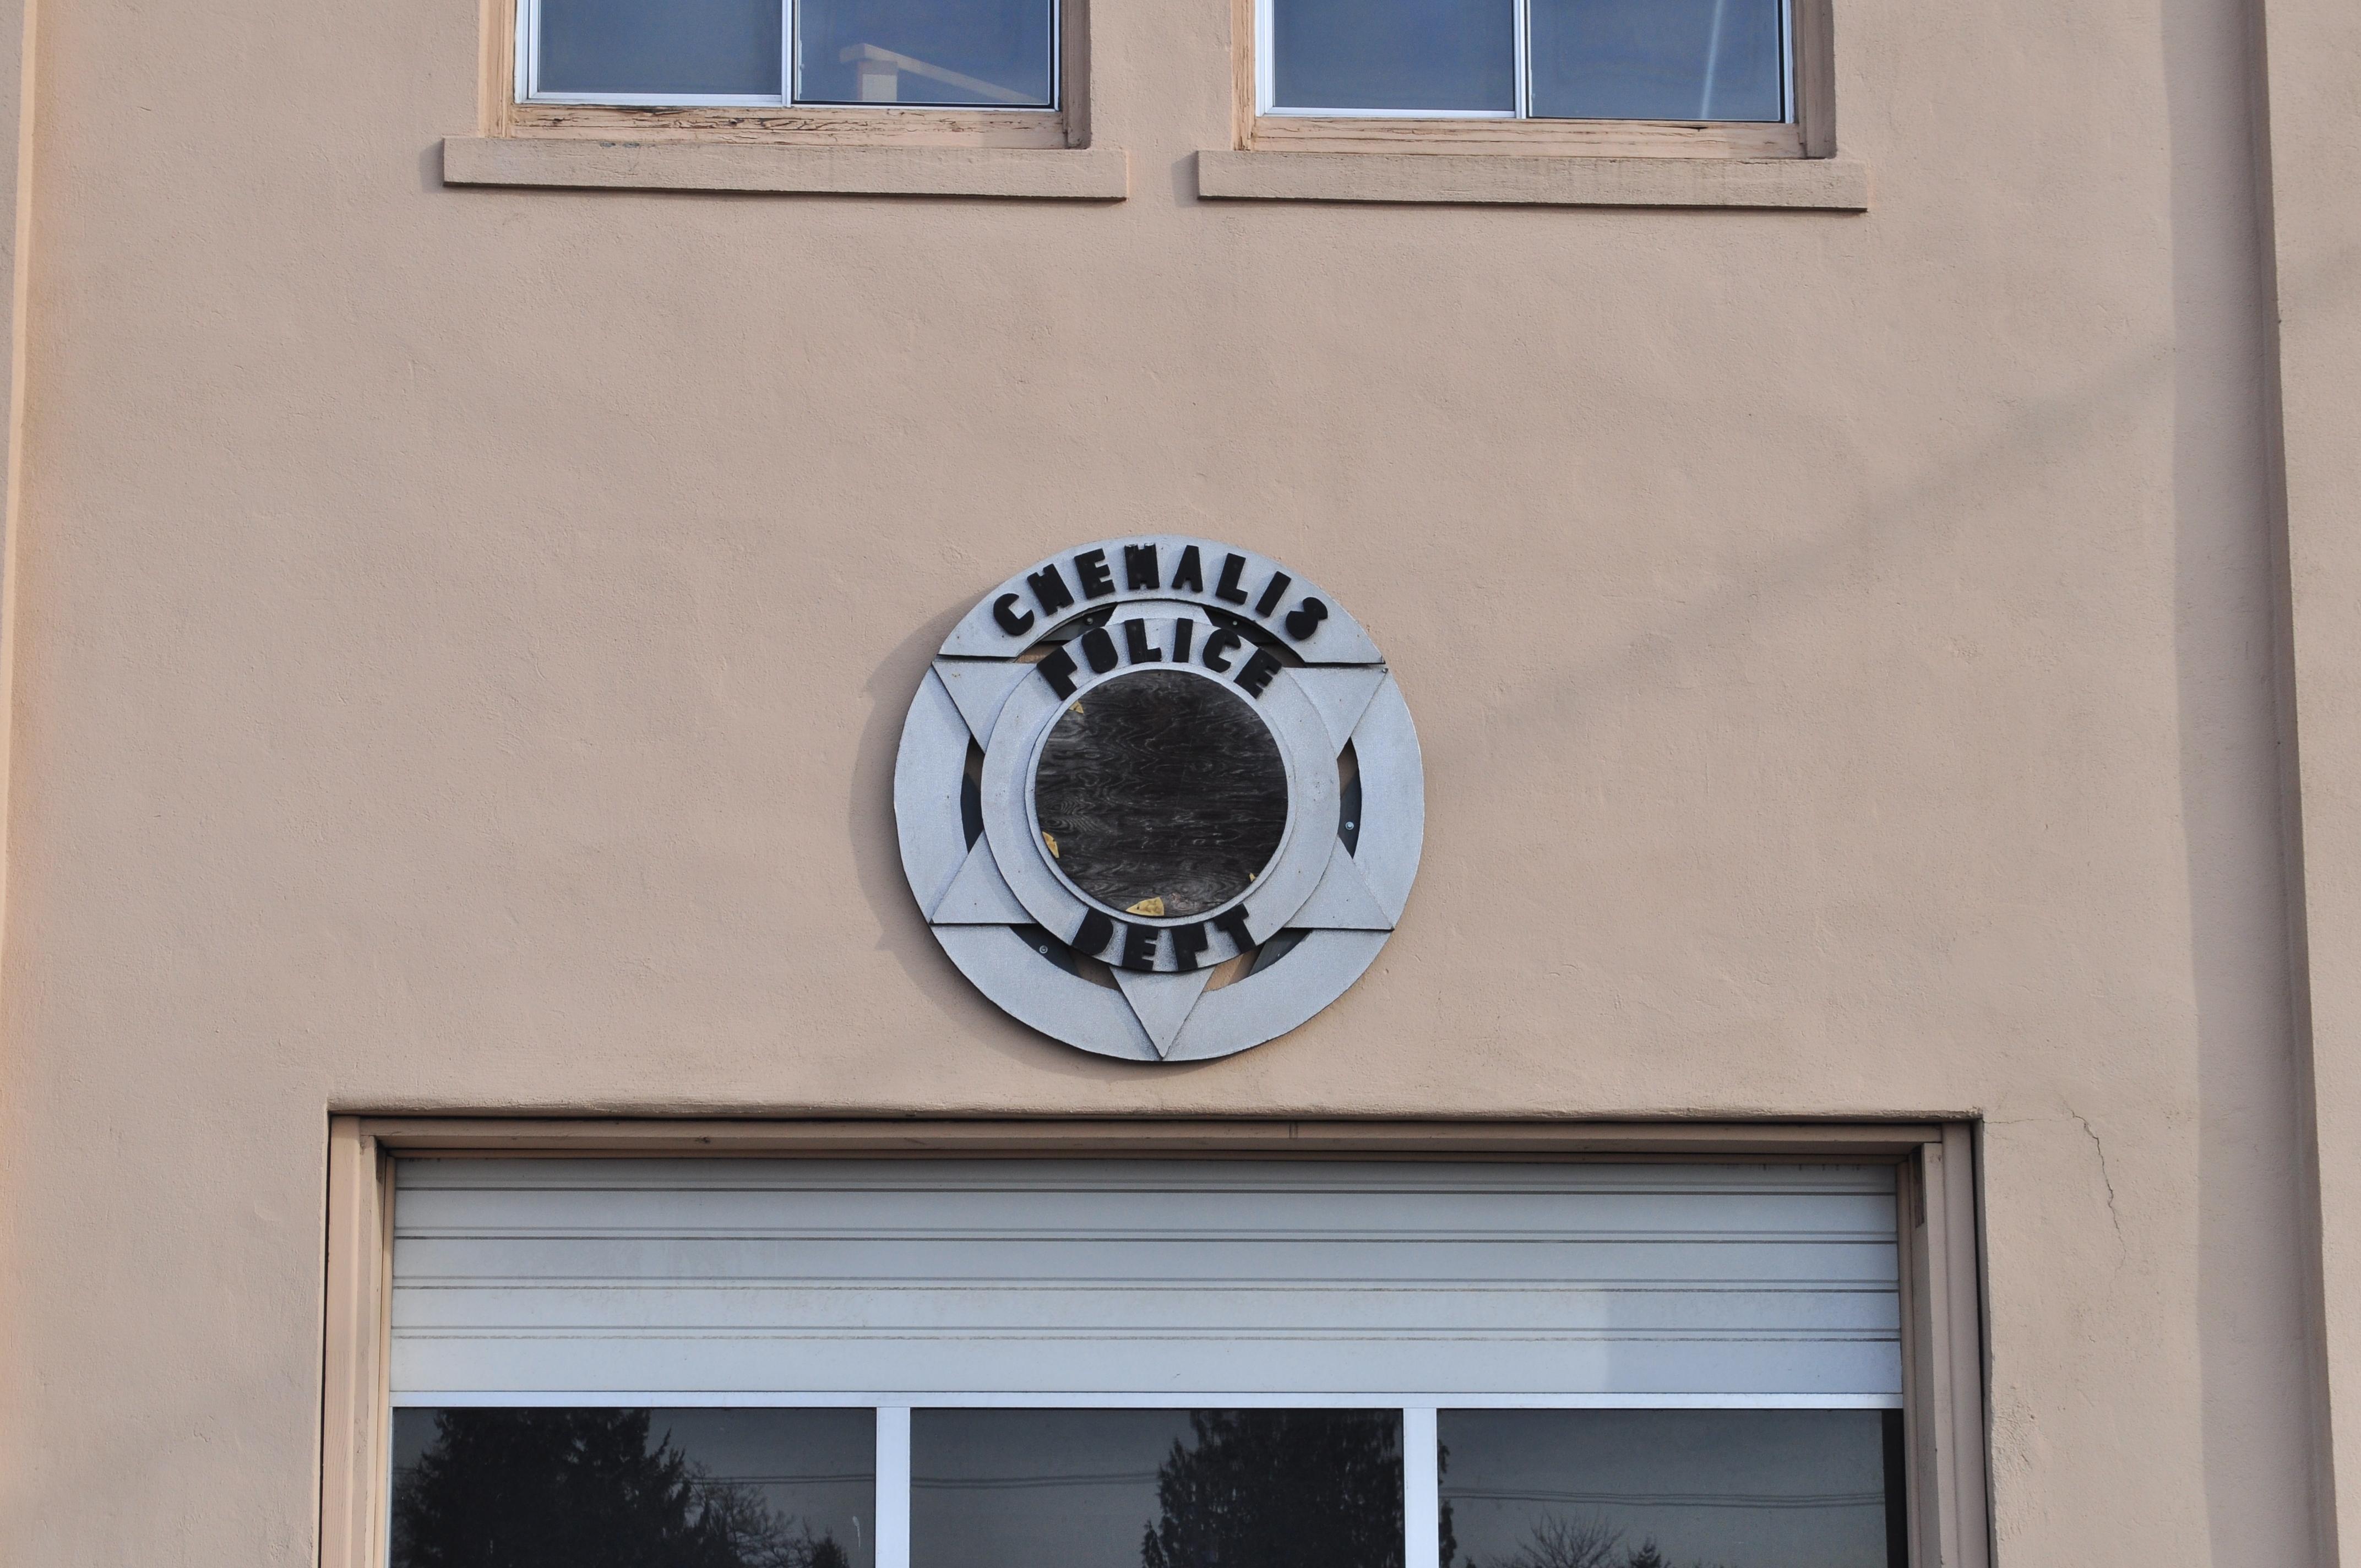 Chehalis Building Department